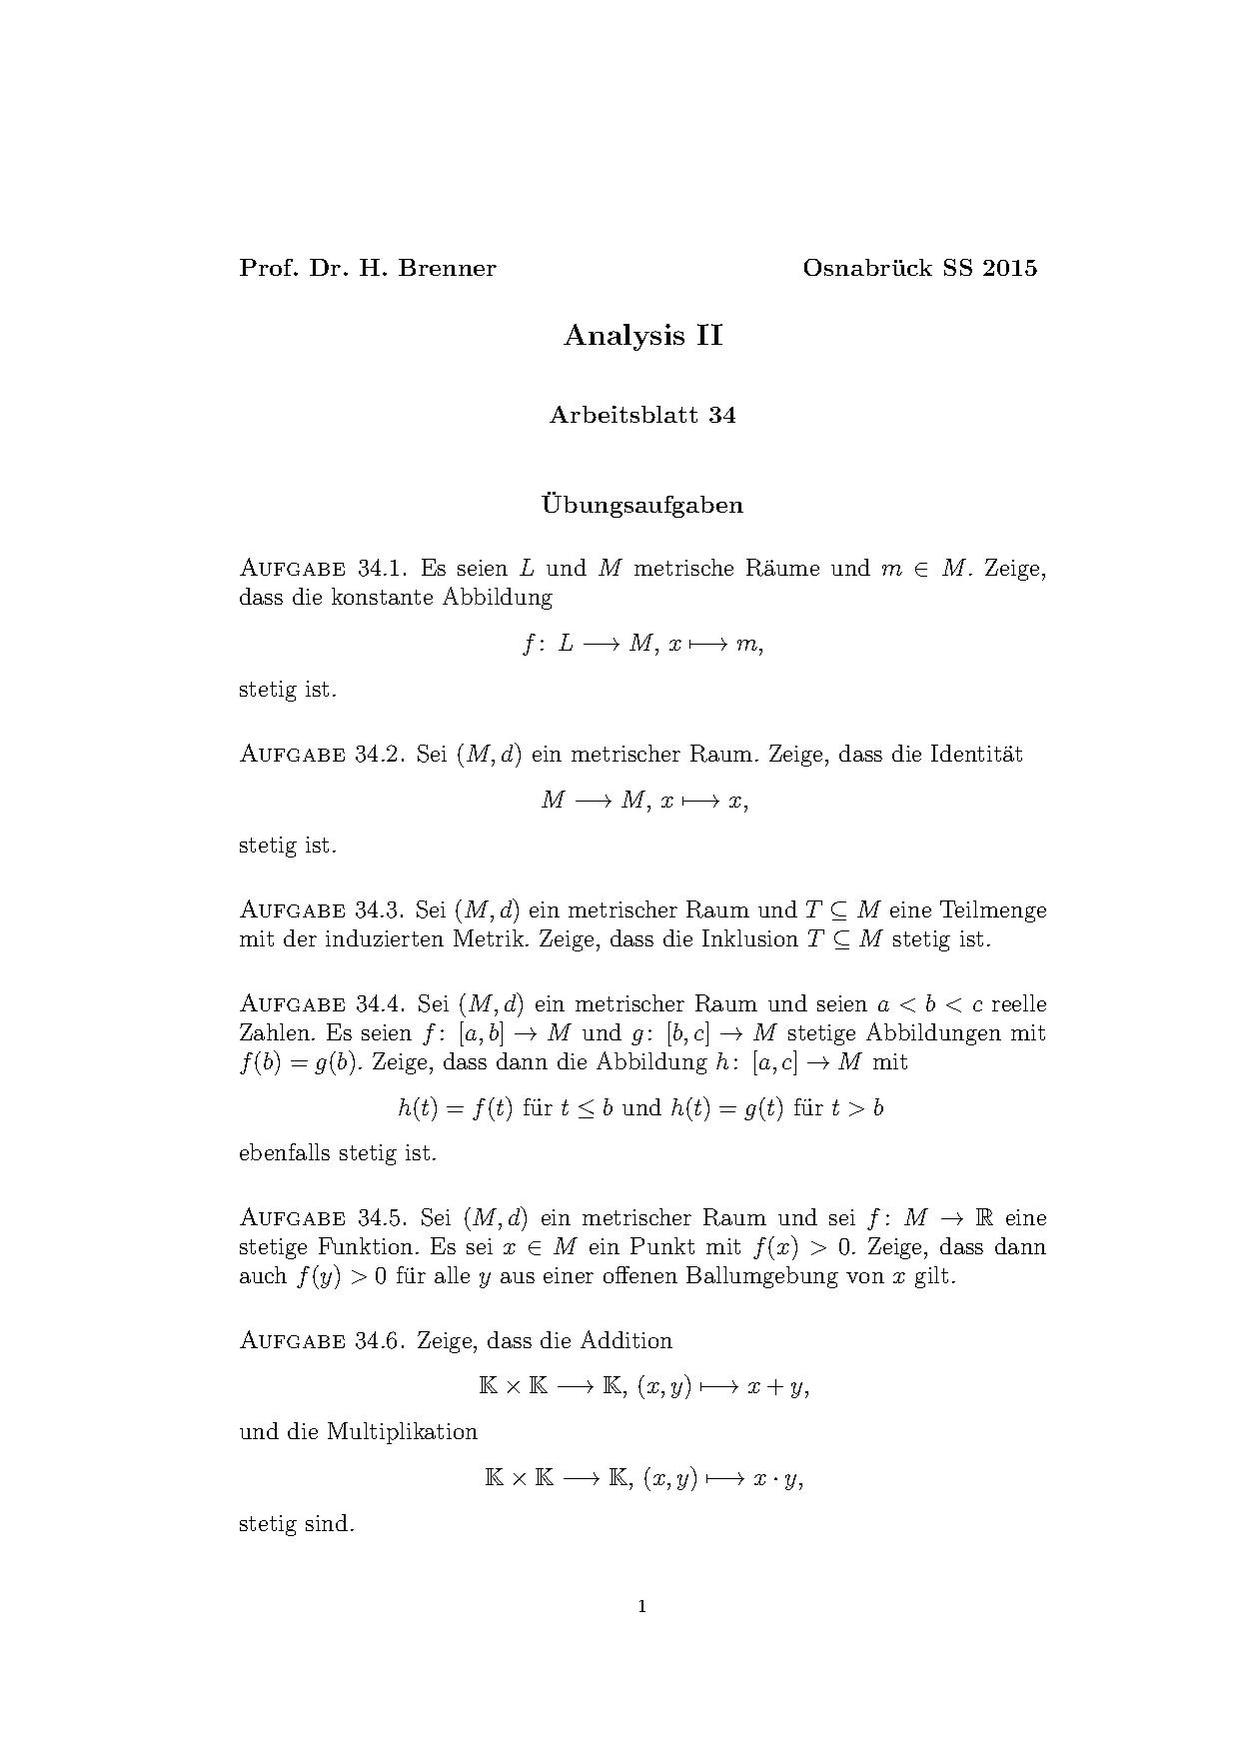 Berühmt Beweisen Identitäten Arbeitsblatt Bilder - Mathe ...